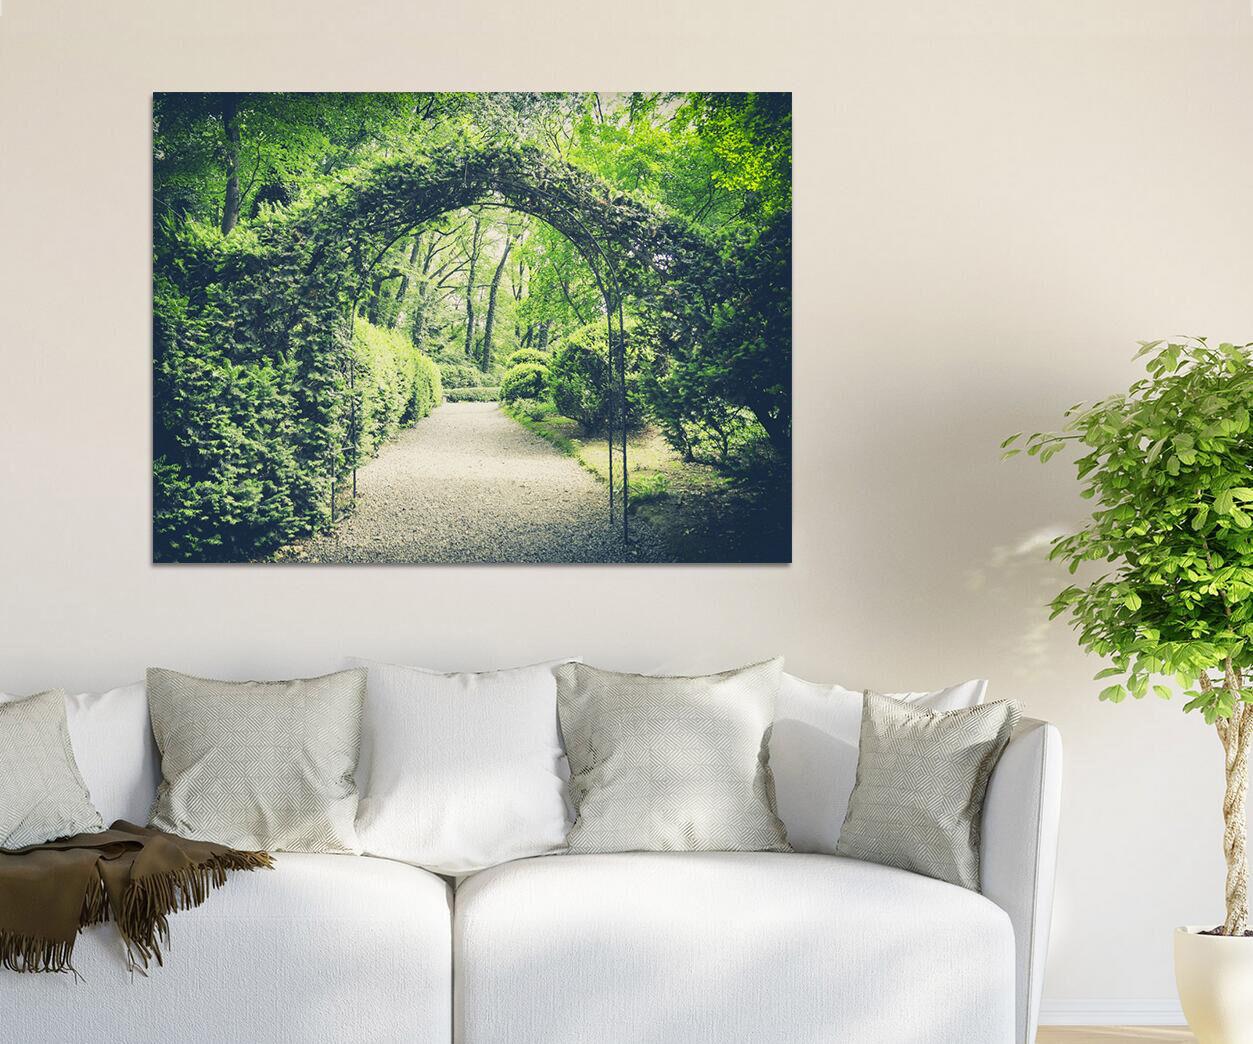 3D Emotionalitt Grner Baum 74 Fototapeten Wandbild BildTapete AJSTORE DE Lemon